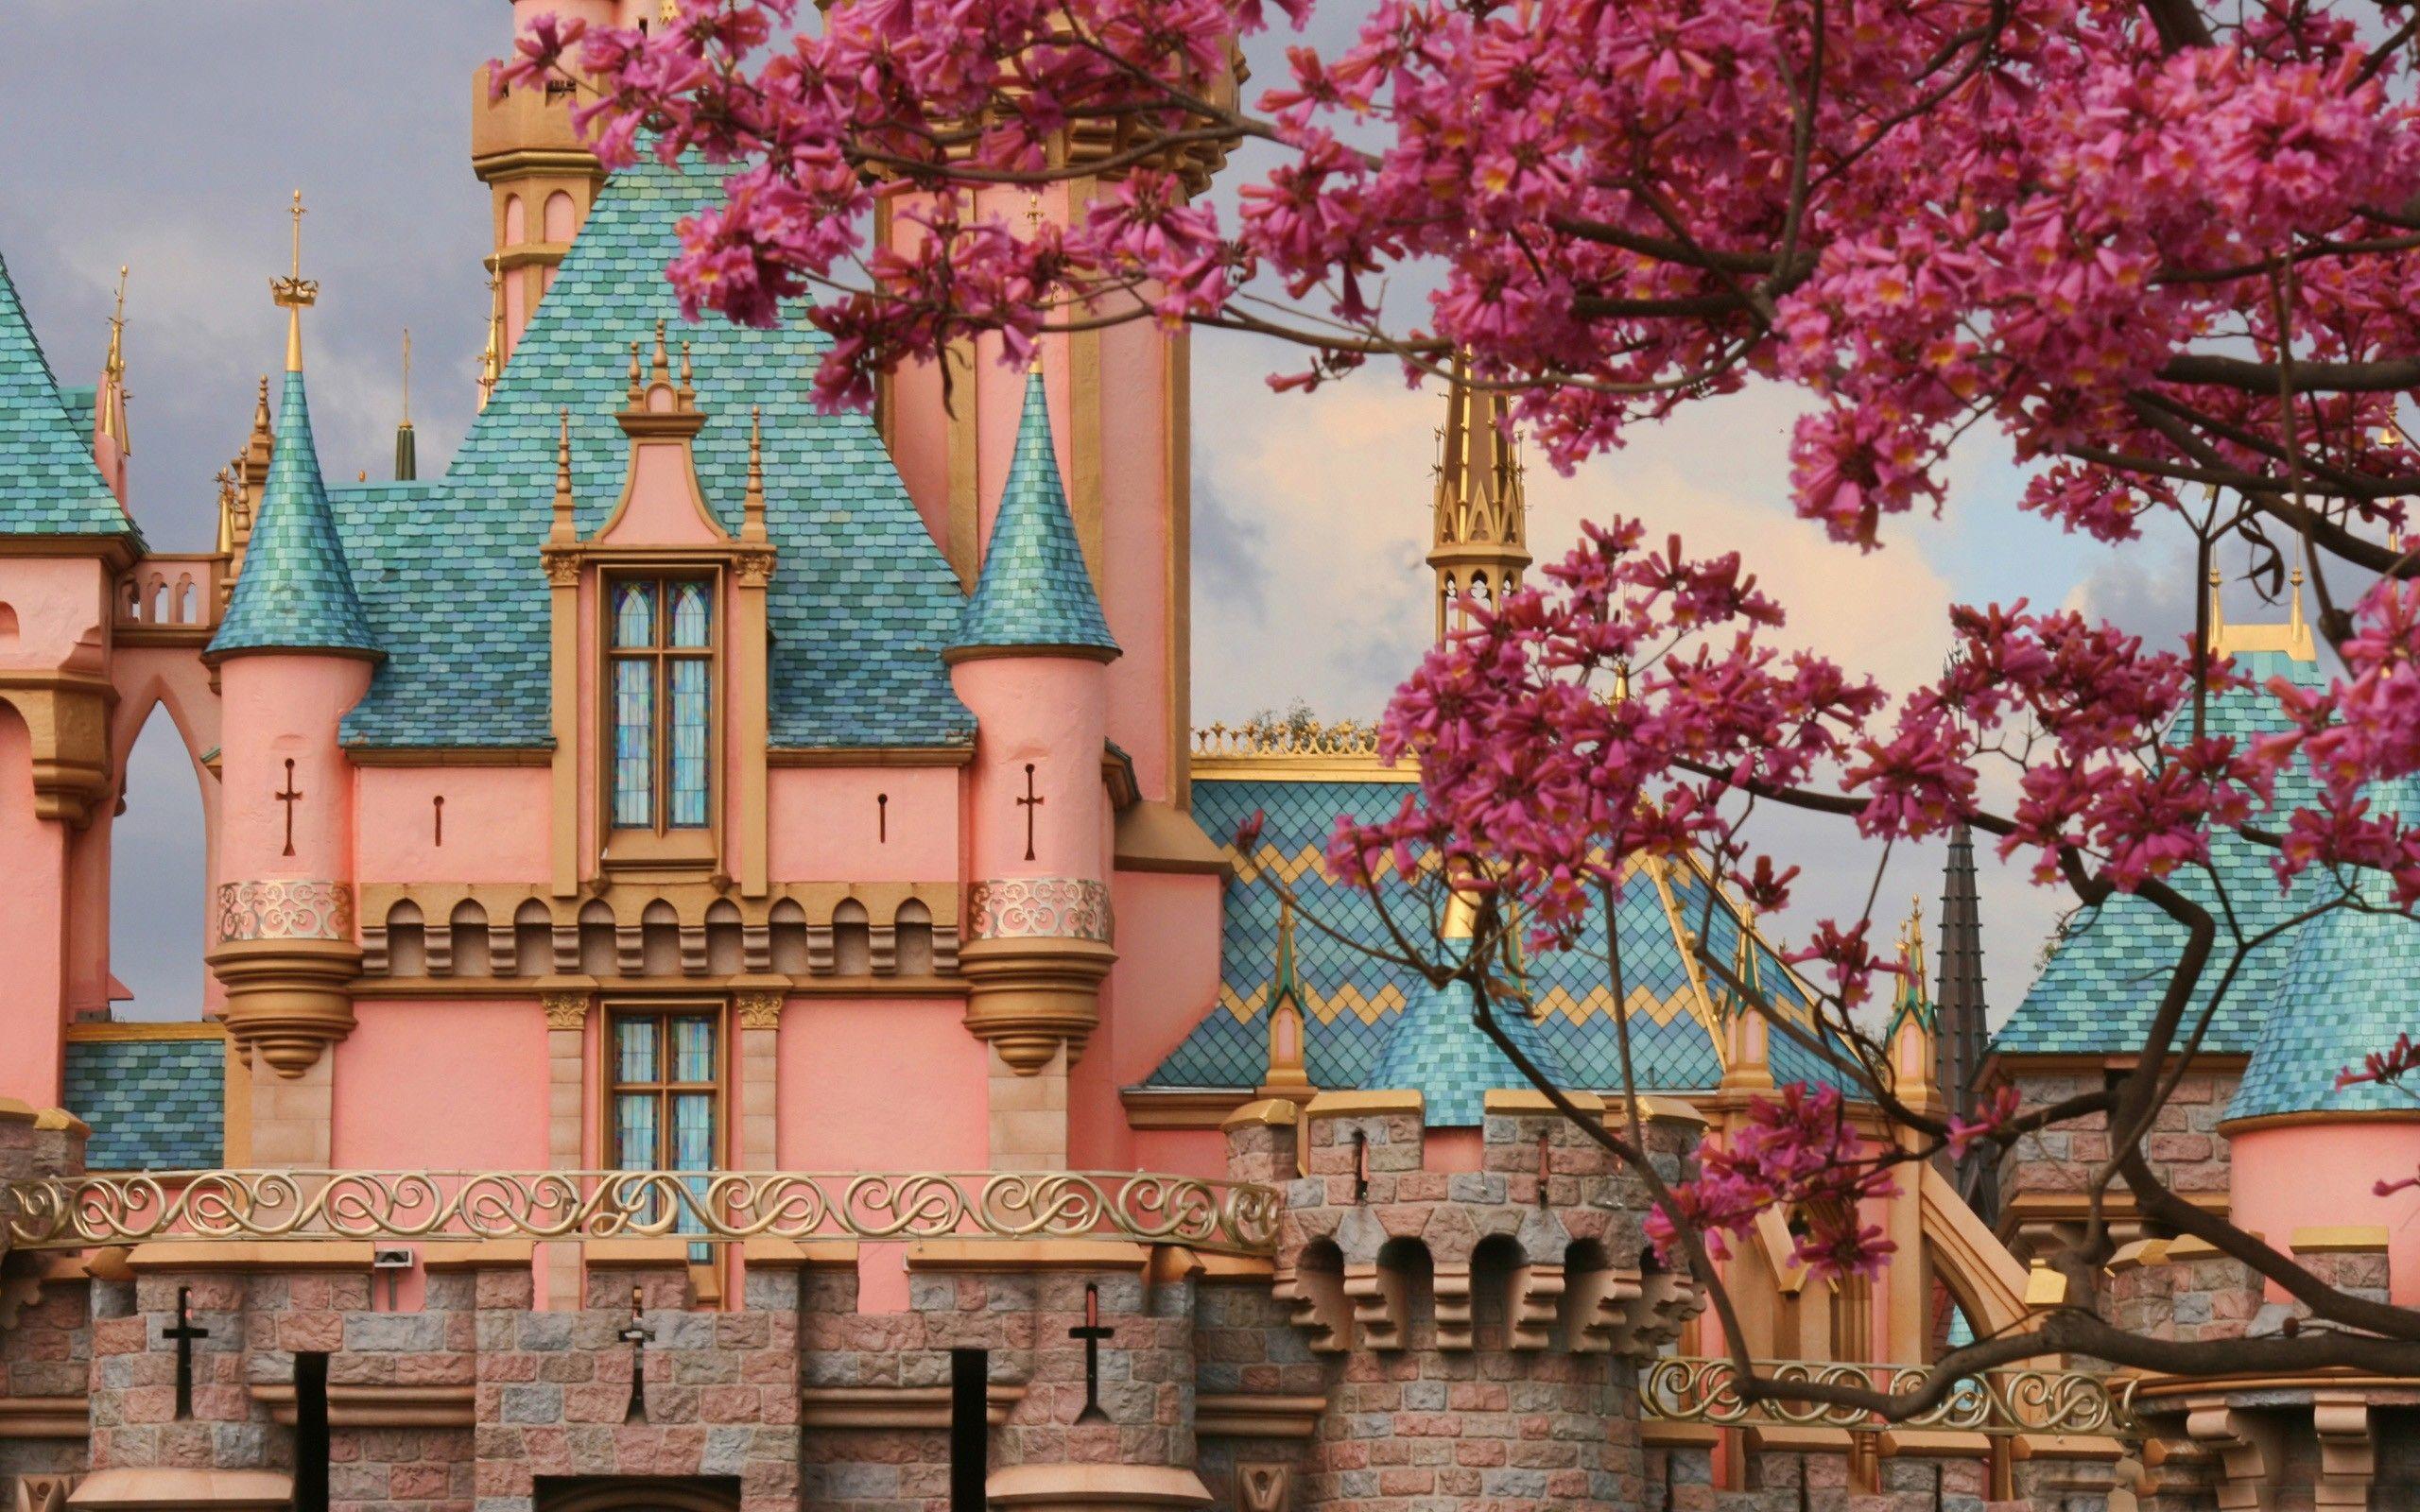 fairytale castle | book ideas: fairytales | pinterest | castles